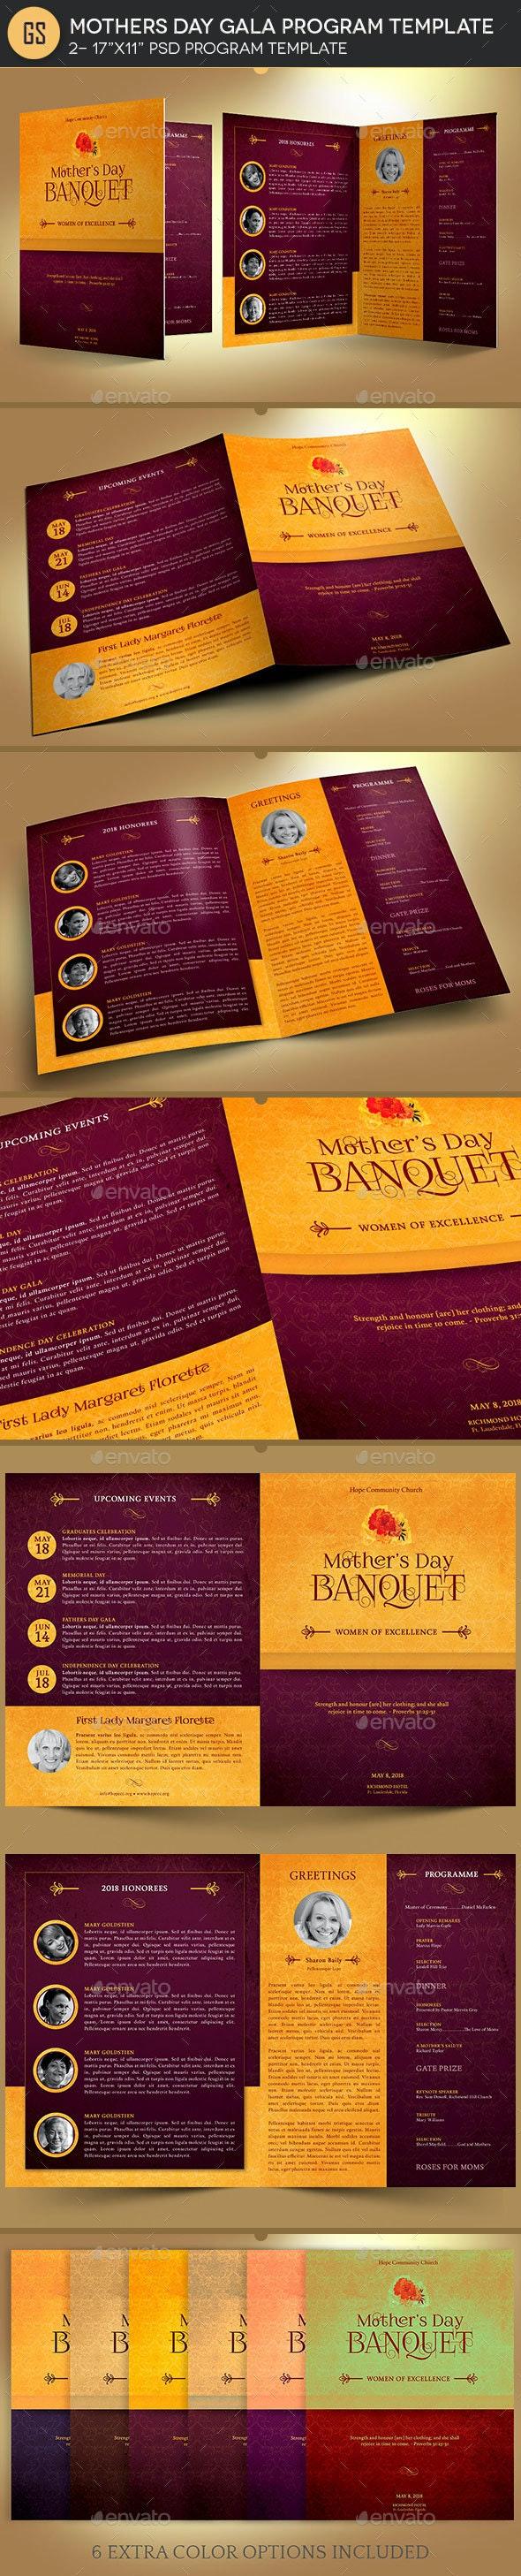 Mothers Day Gala Program Template - Informational Brochures